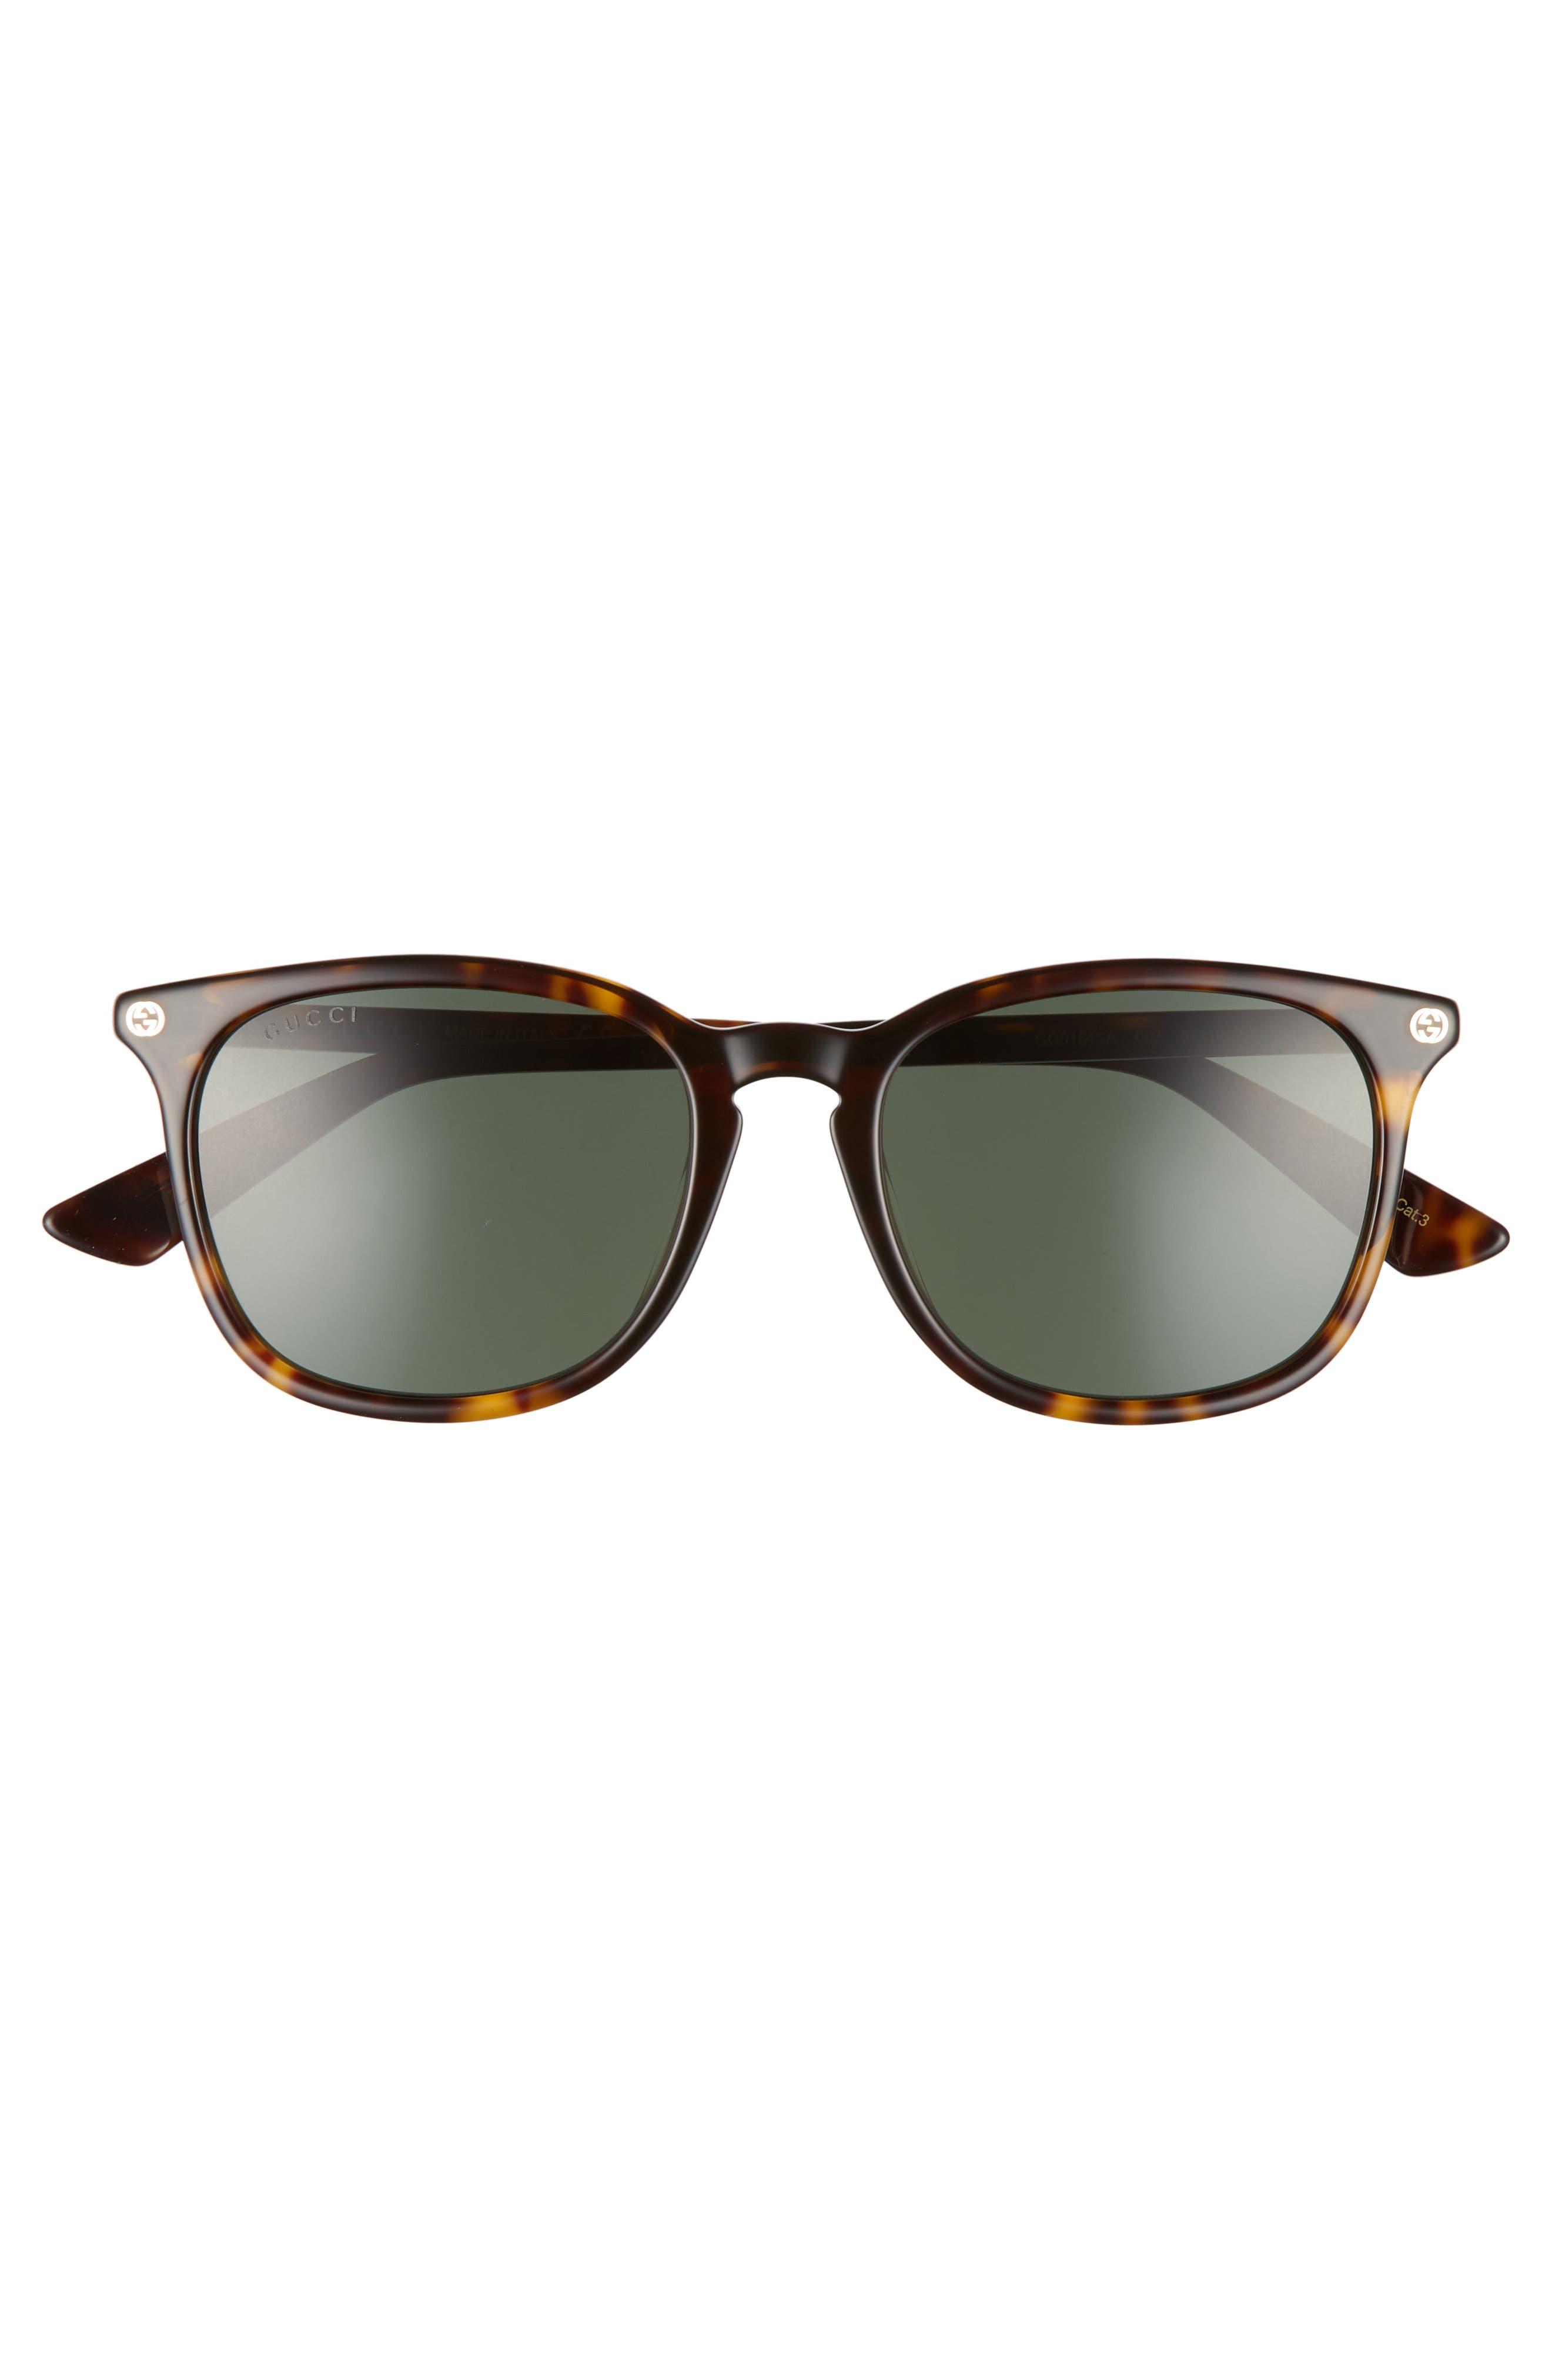 5ef4407902 Men s Gucci Sunglasses   Eyeglasses